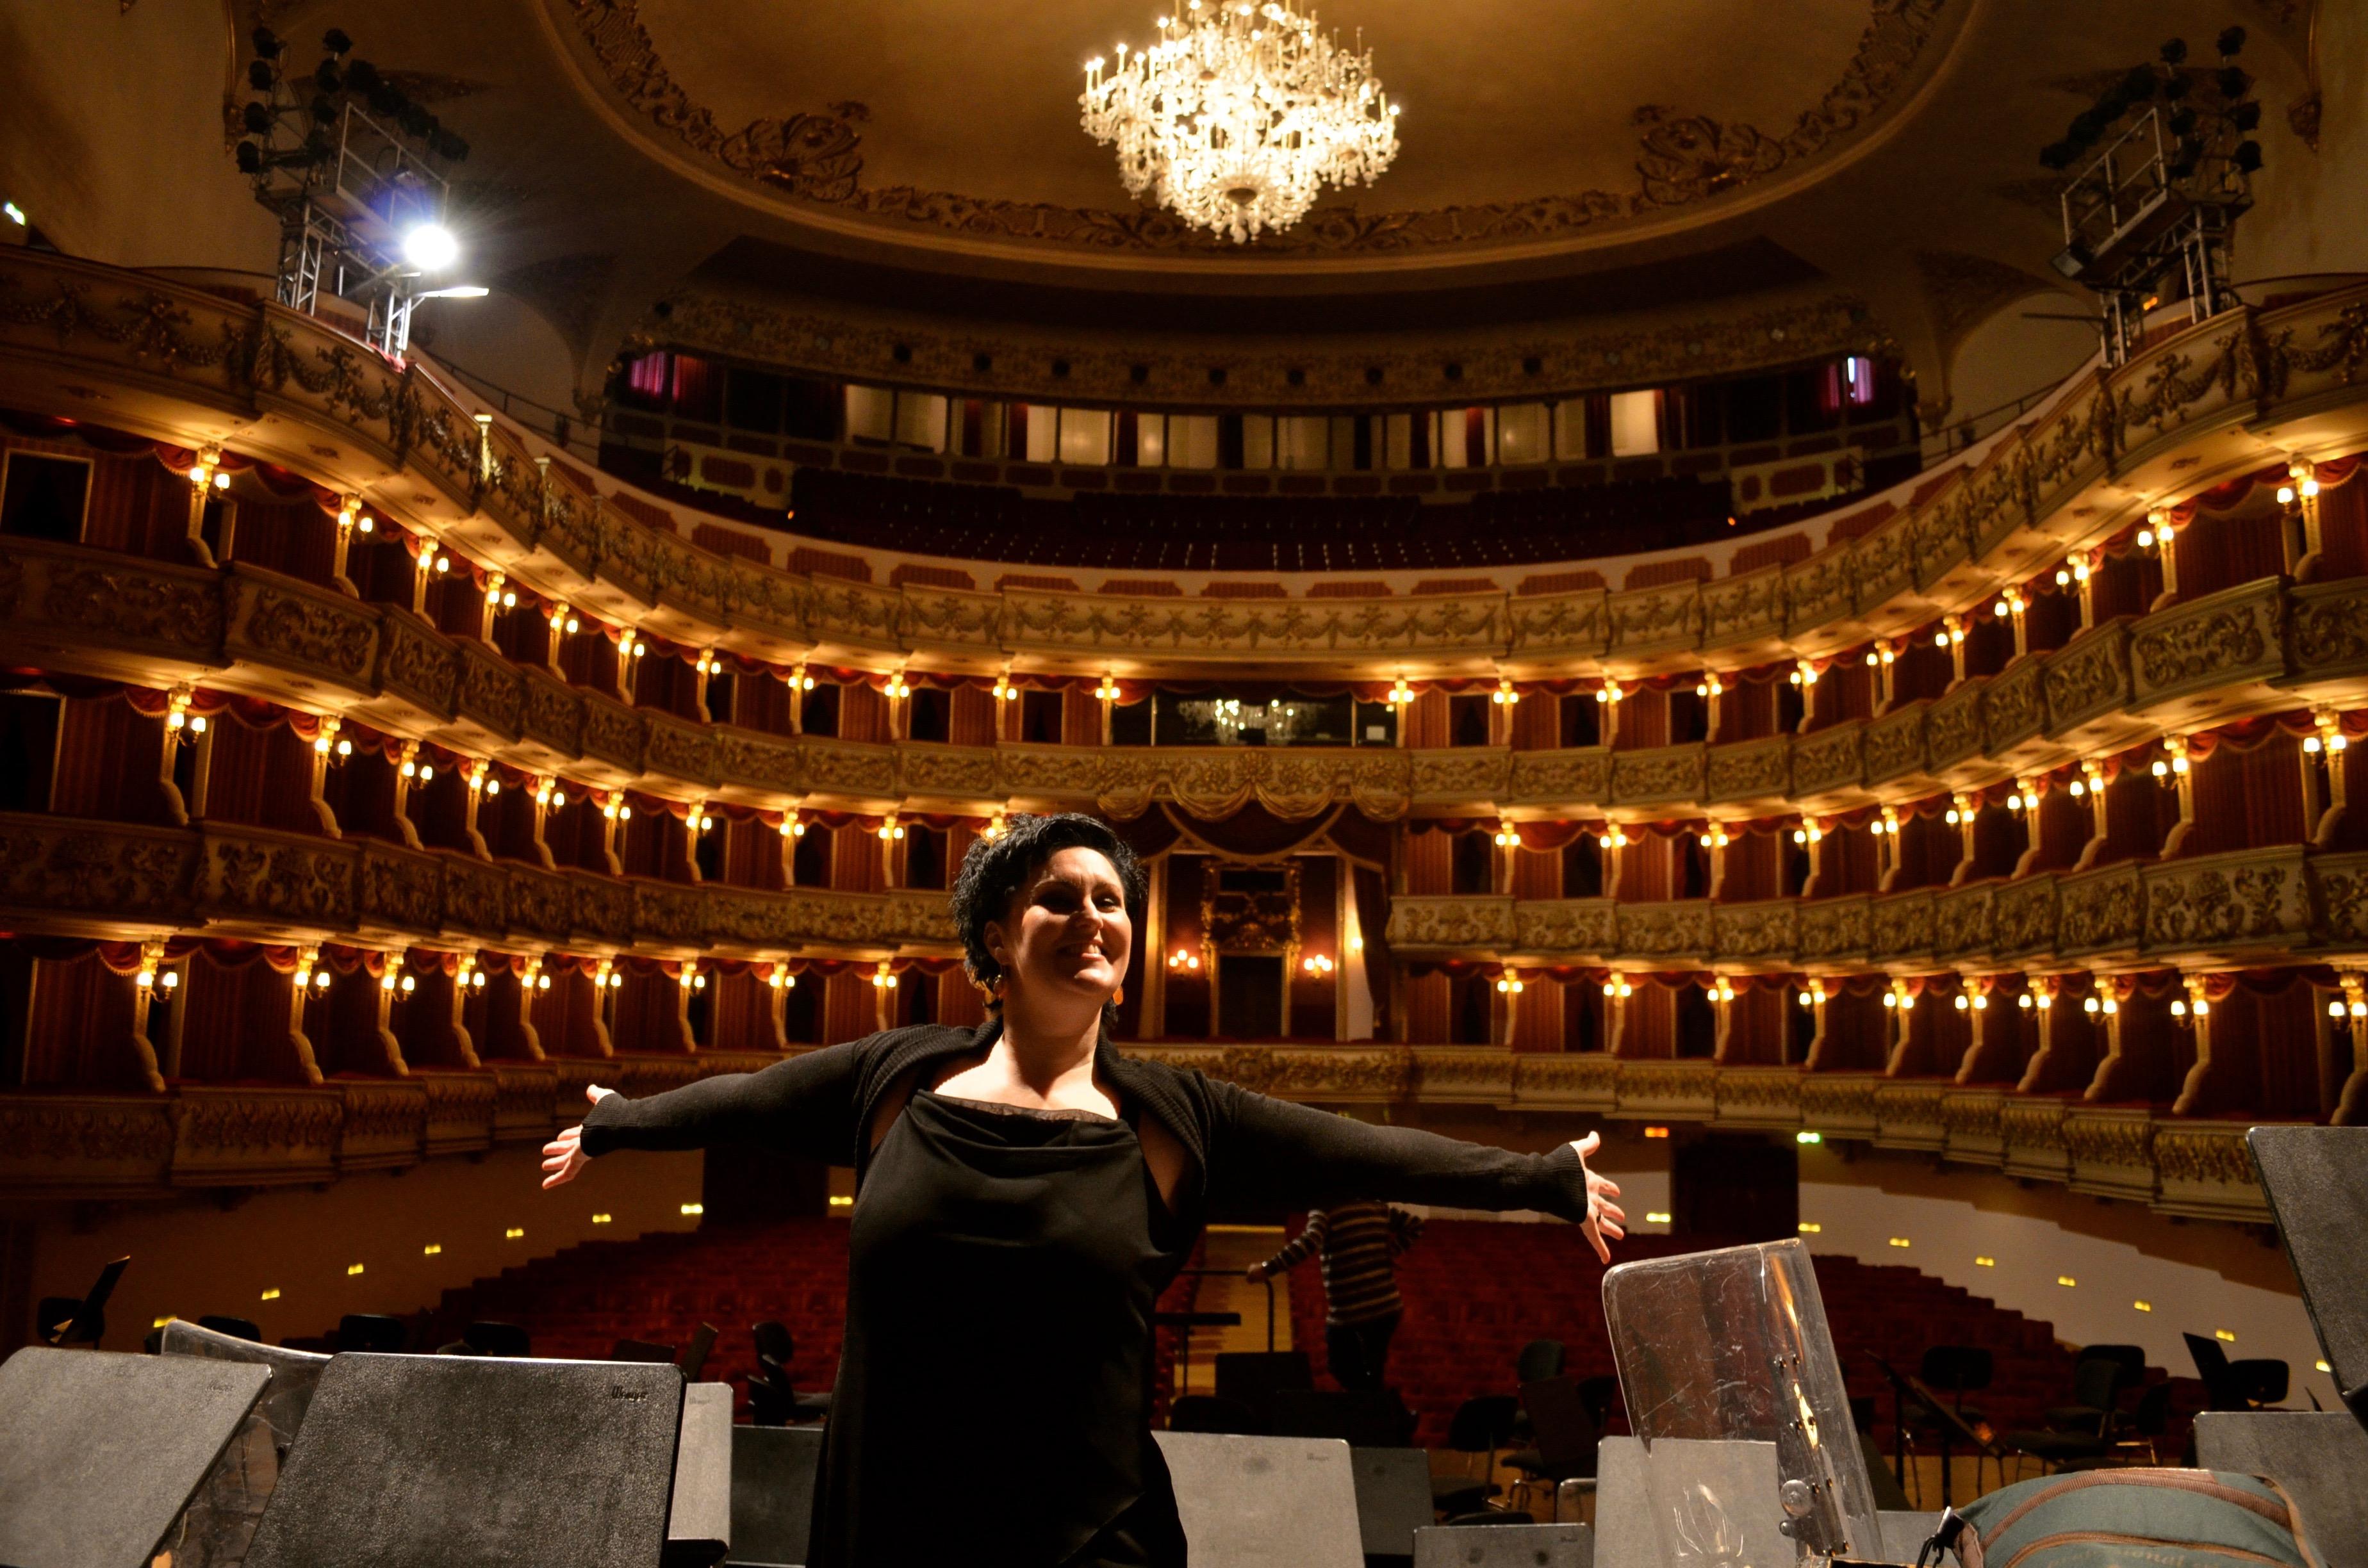 France Teatro Filarmonico